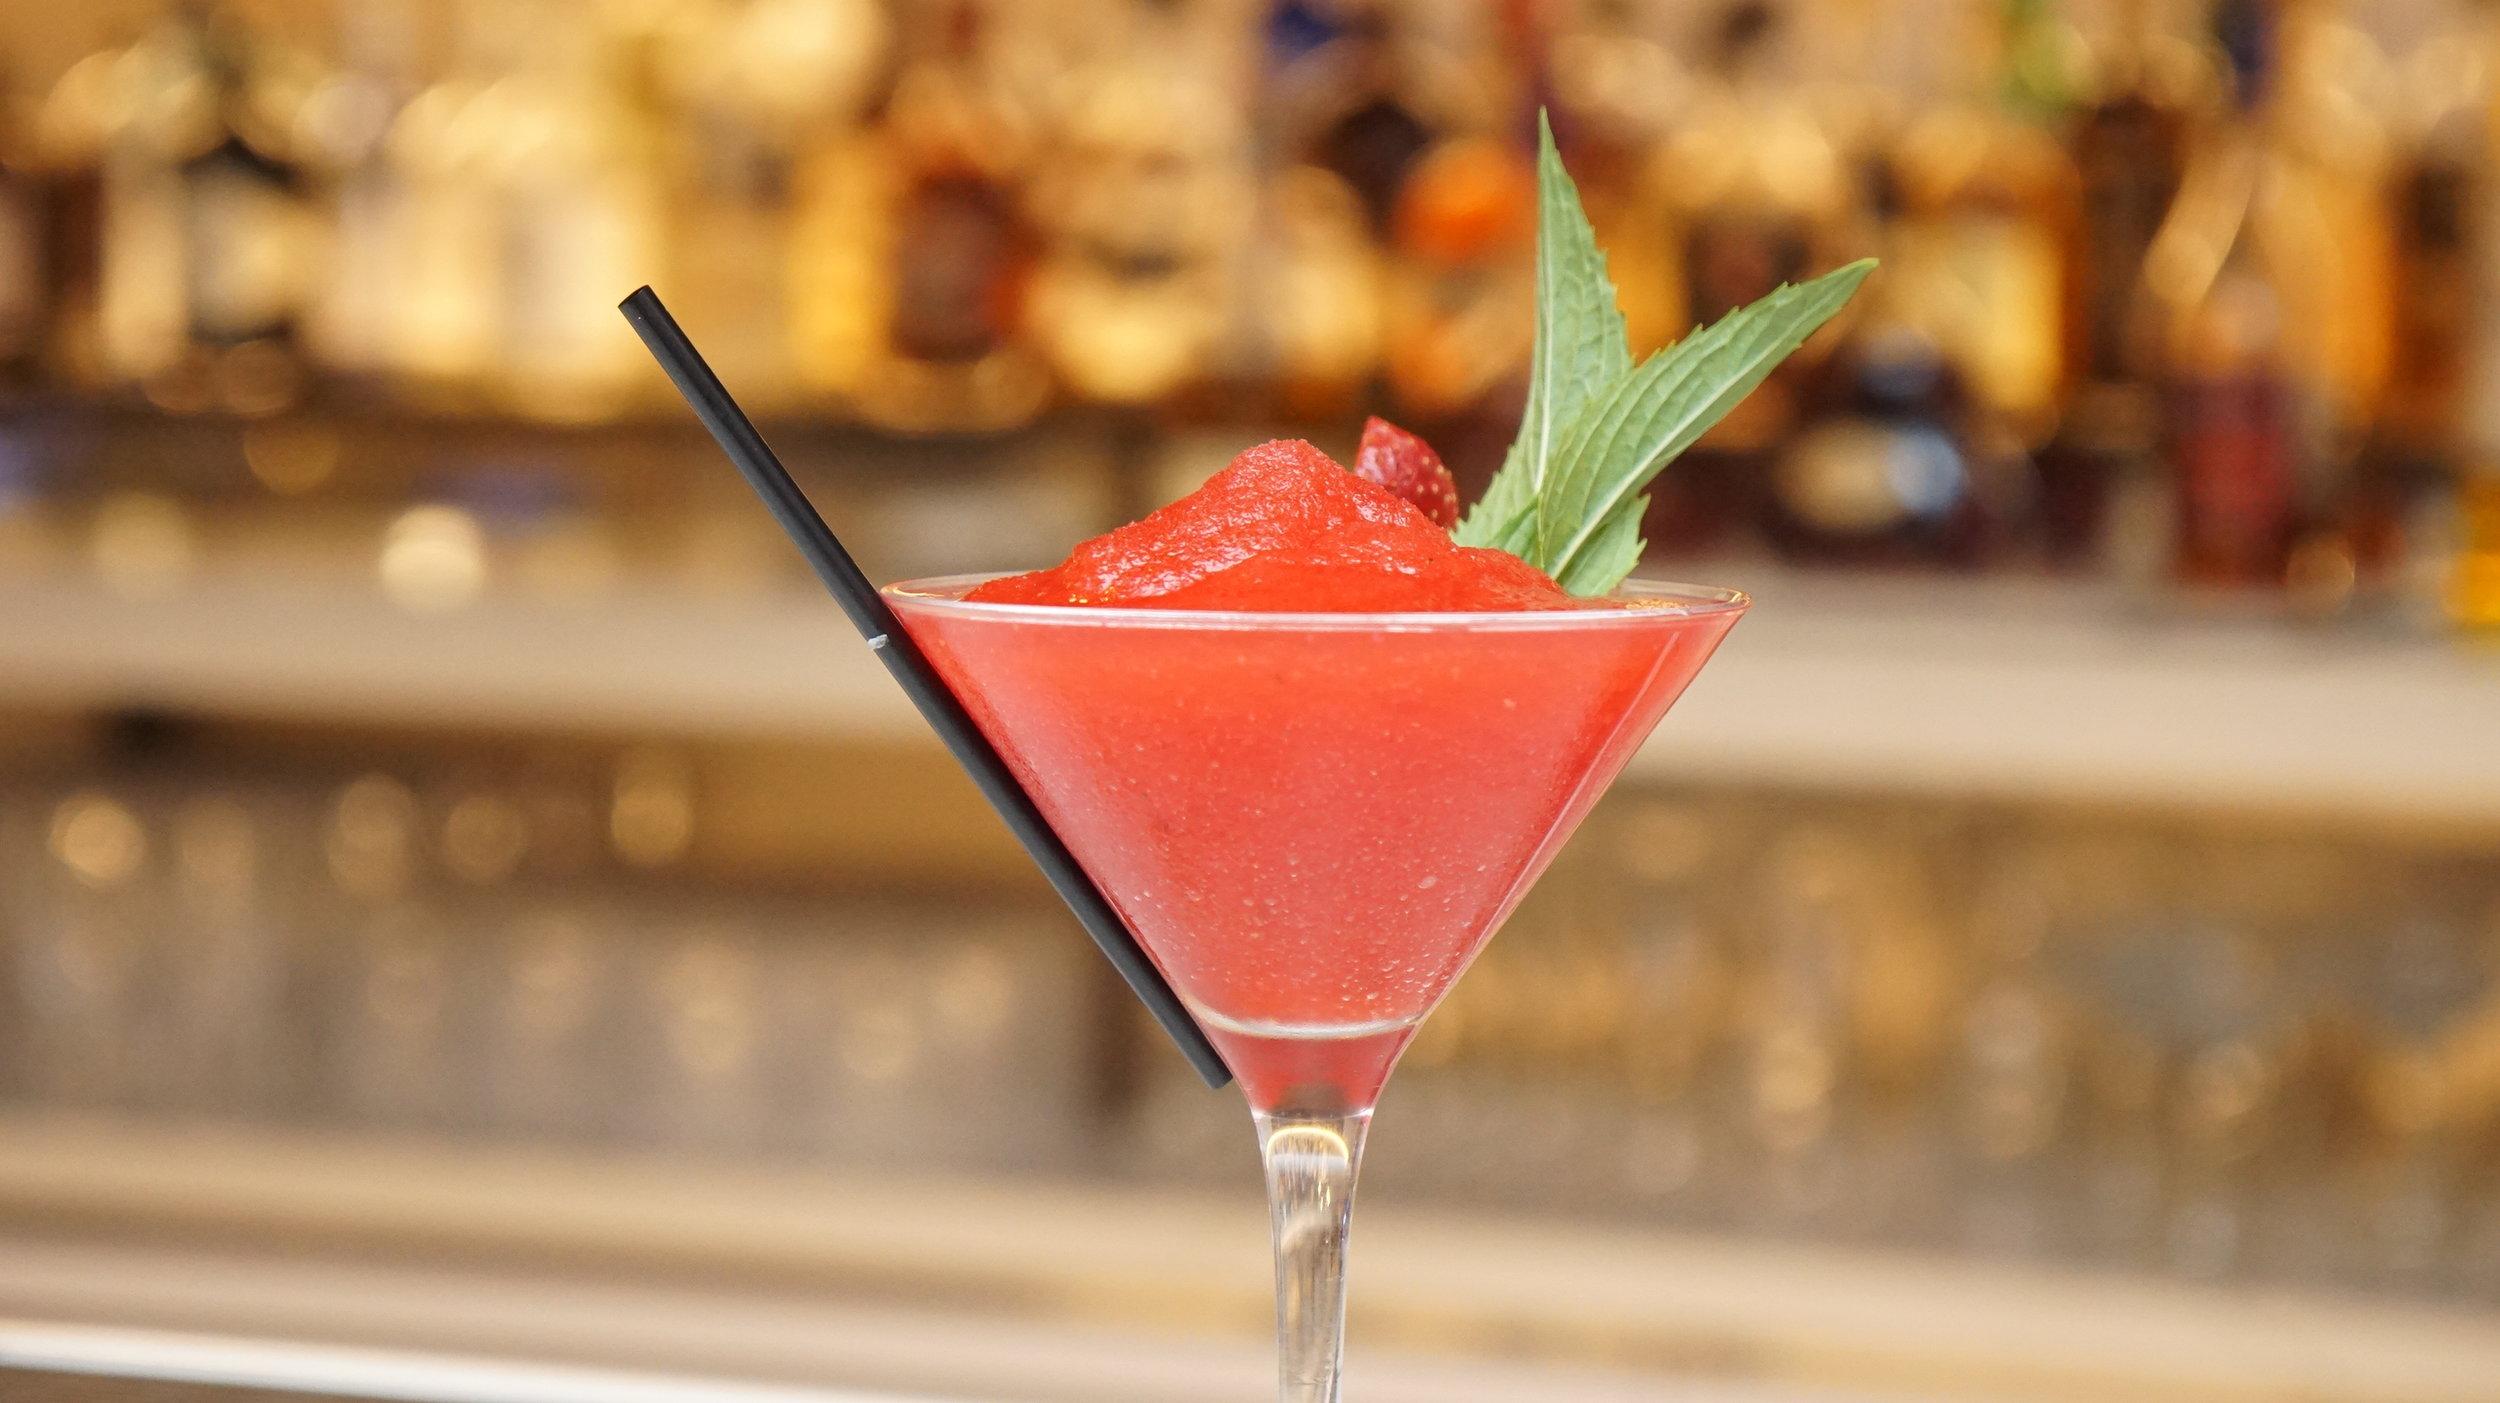 The Loft Cocktail